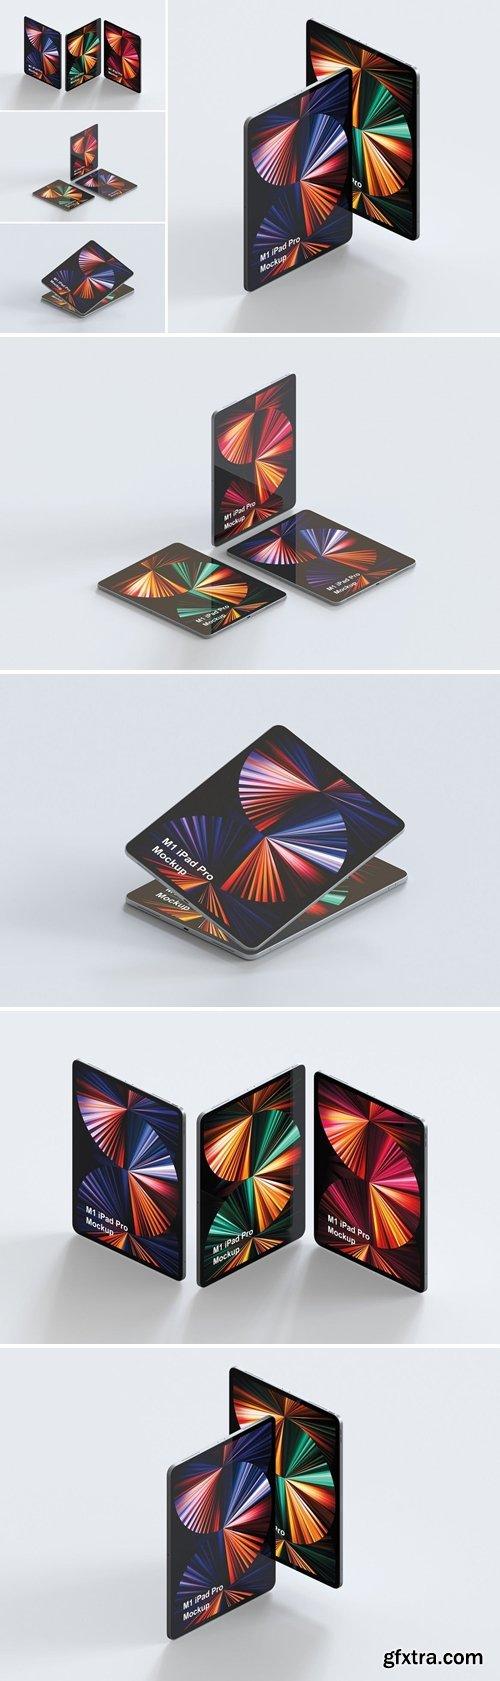 M1 iPad Pro Mockup